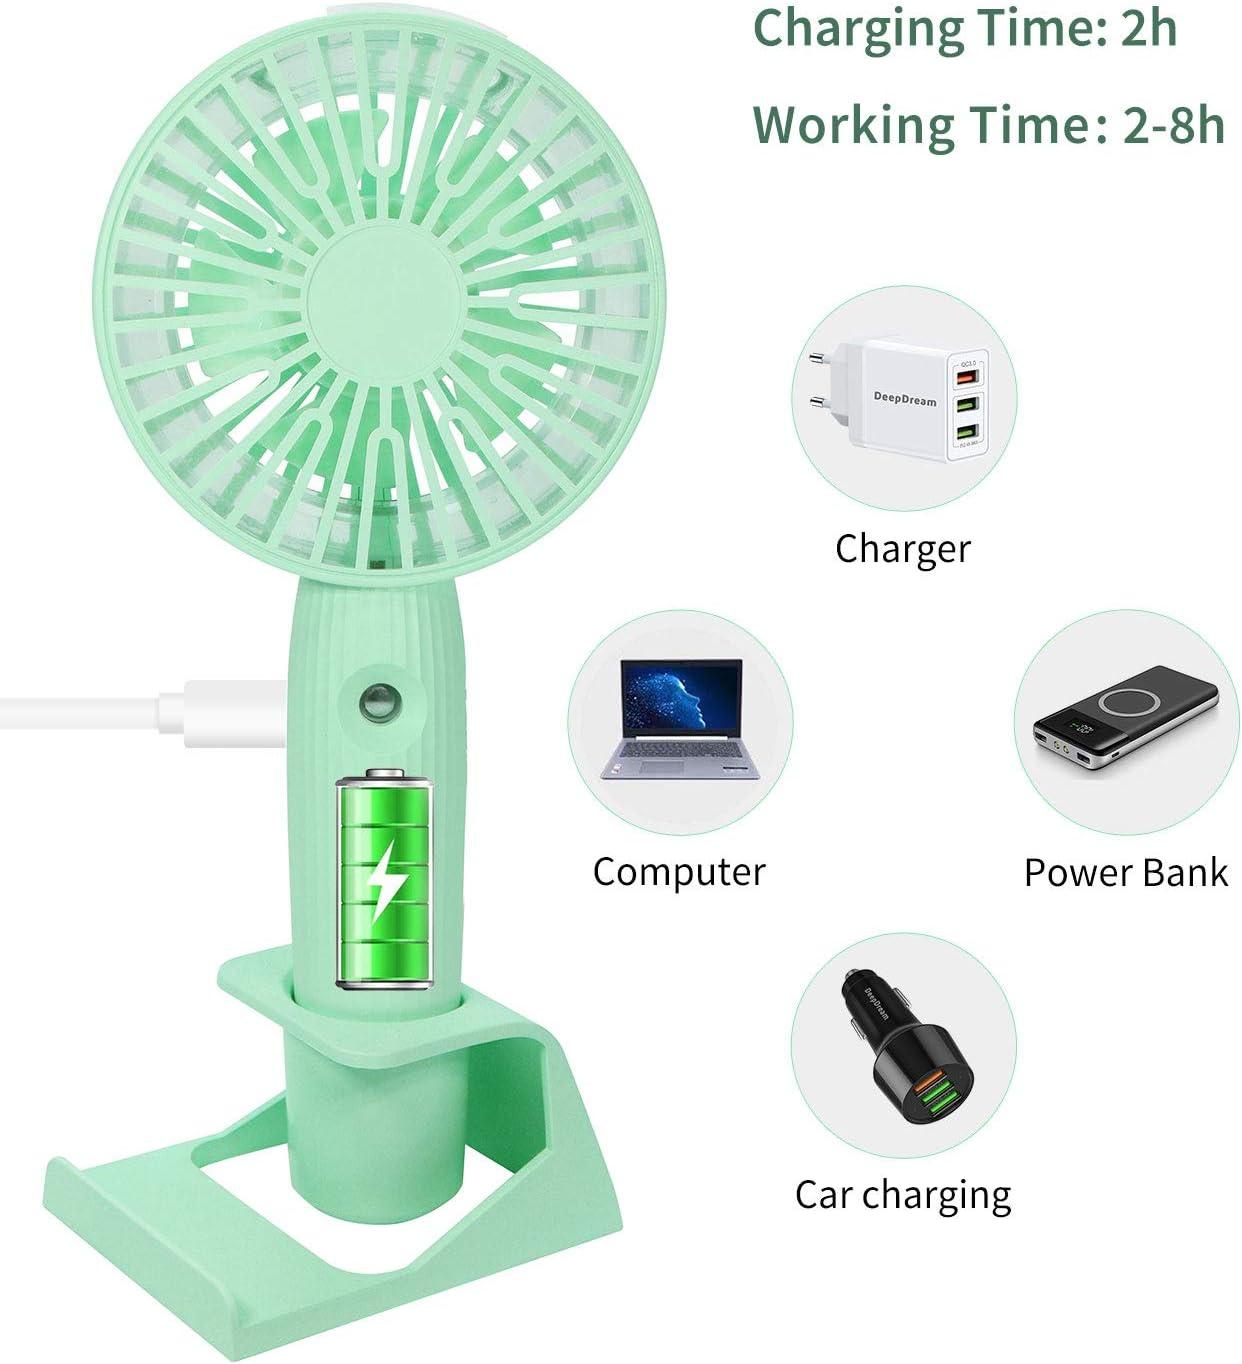 DeepDream Mini Handheld Fan Misting Personal Fan While USB Desk Colorful Nightlight Fan for Kids Girls Woman Man Home Office Outdoor Travel Small Portable Spray Fan Speed Adjustable